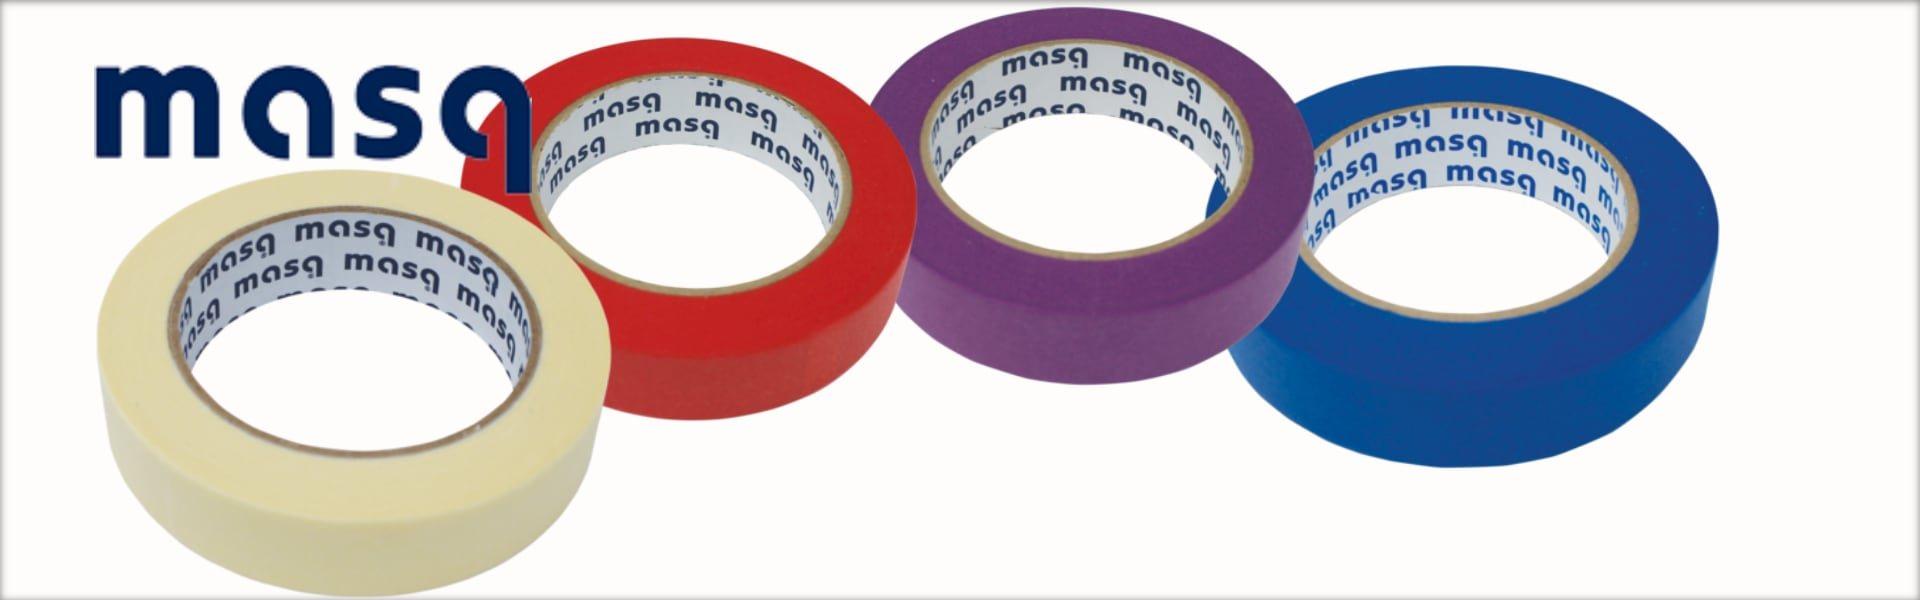 Masq tape